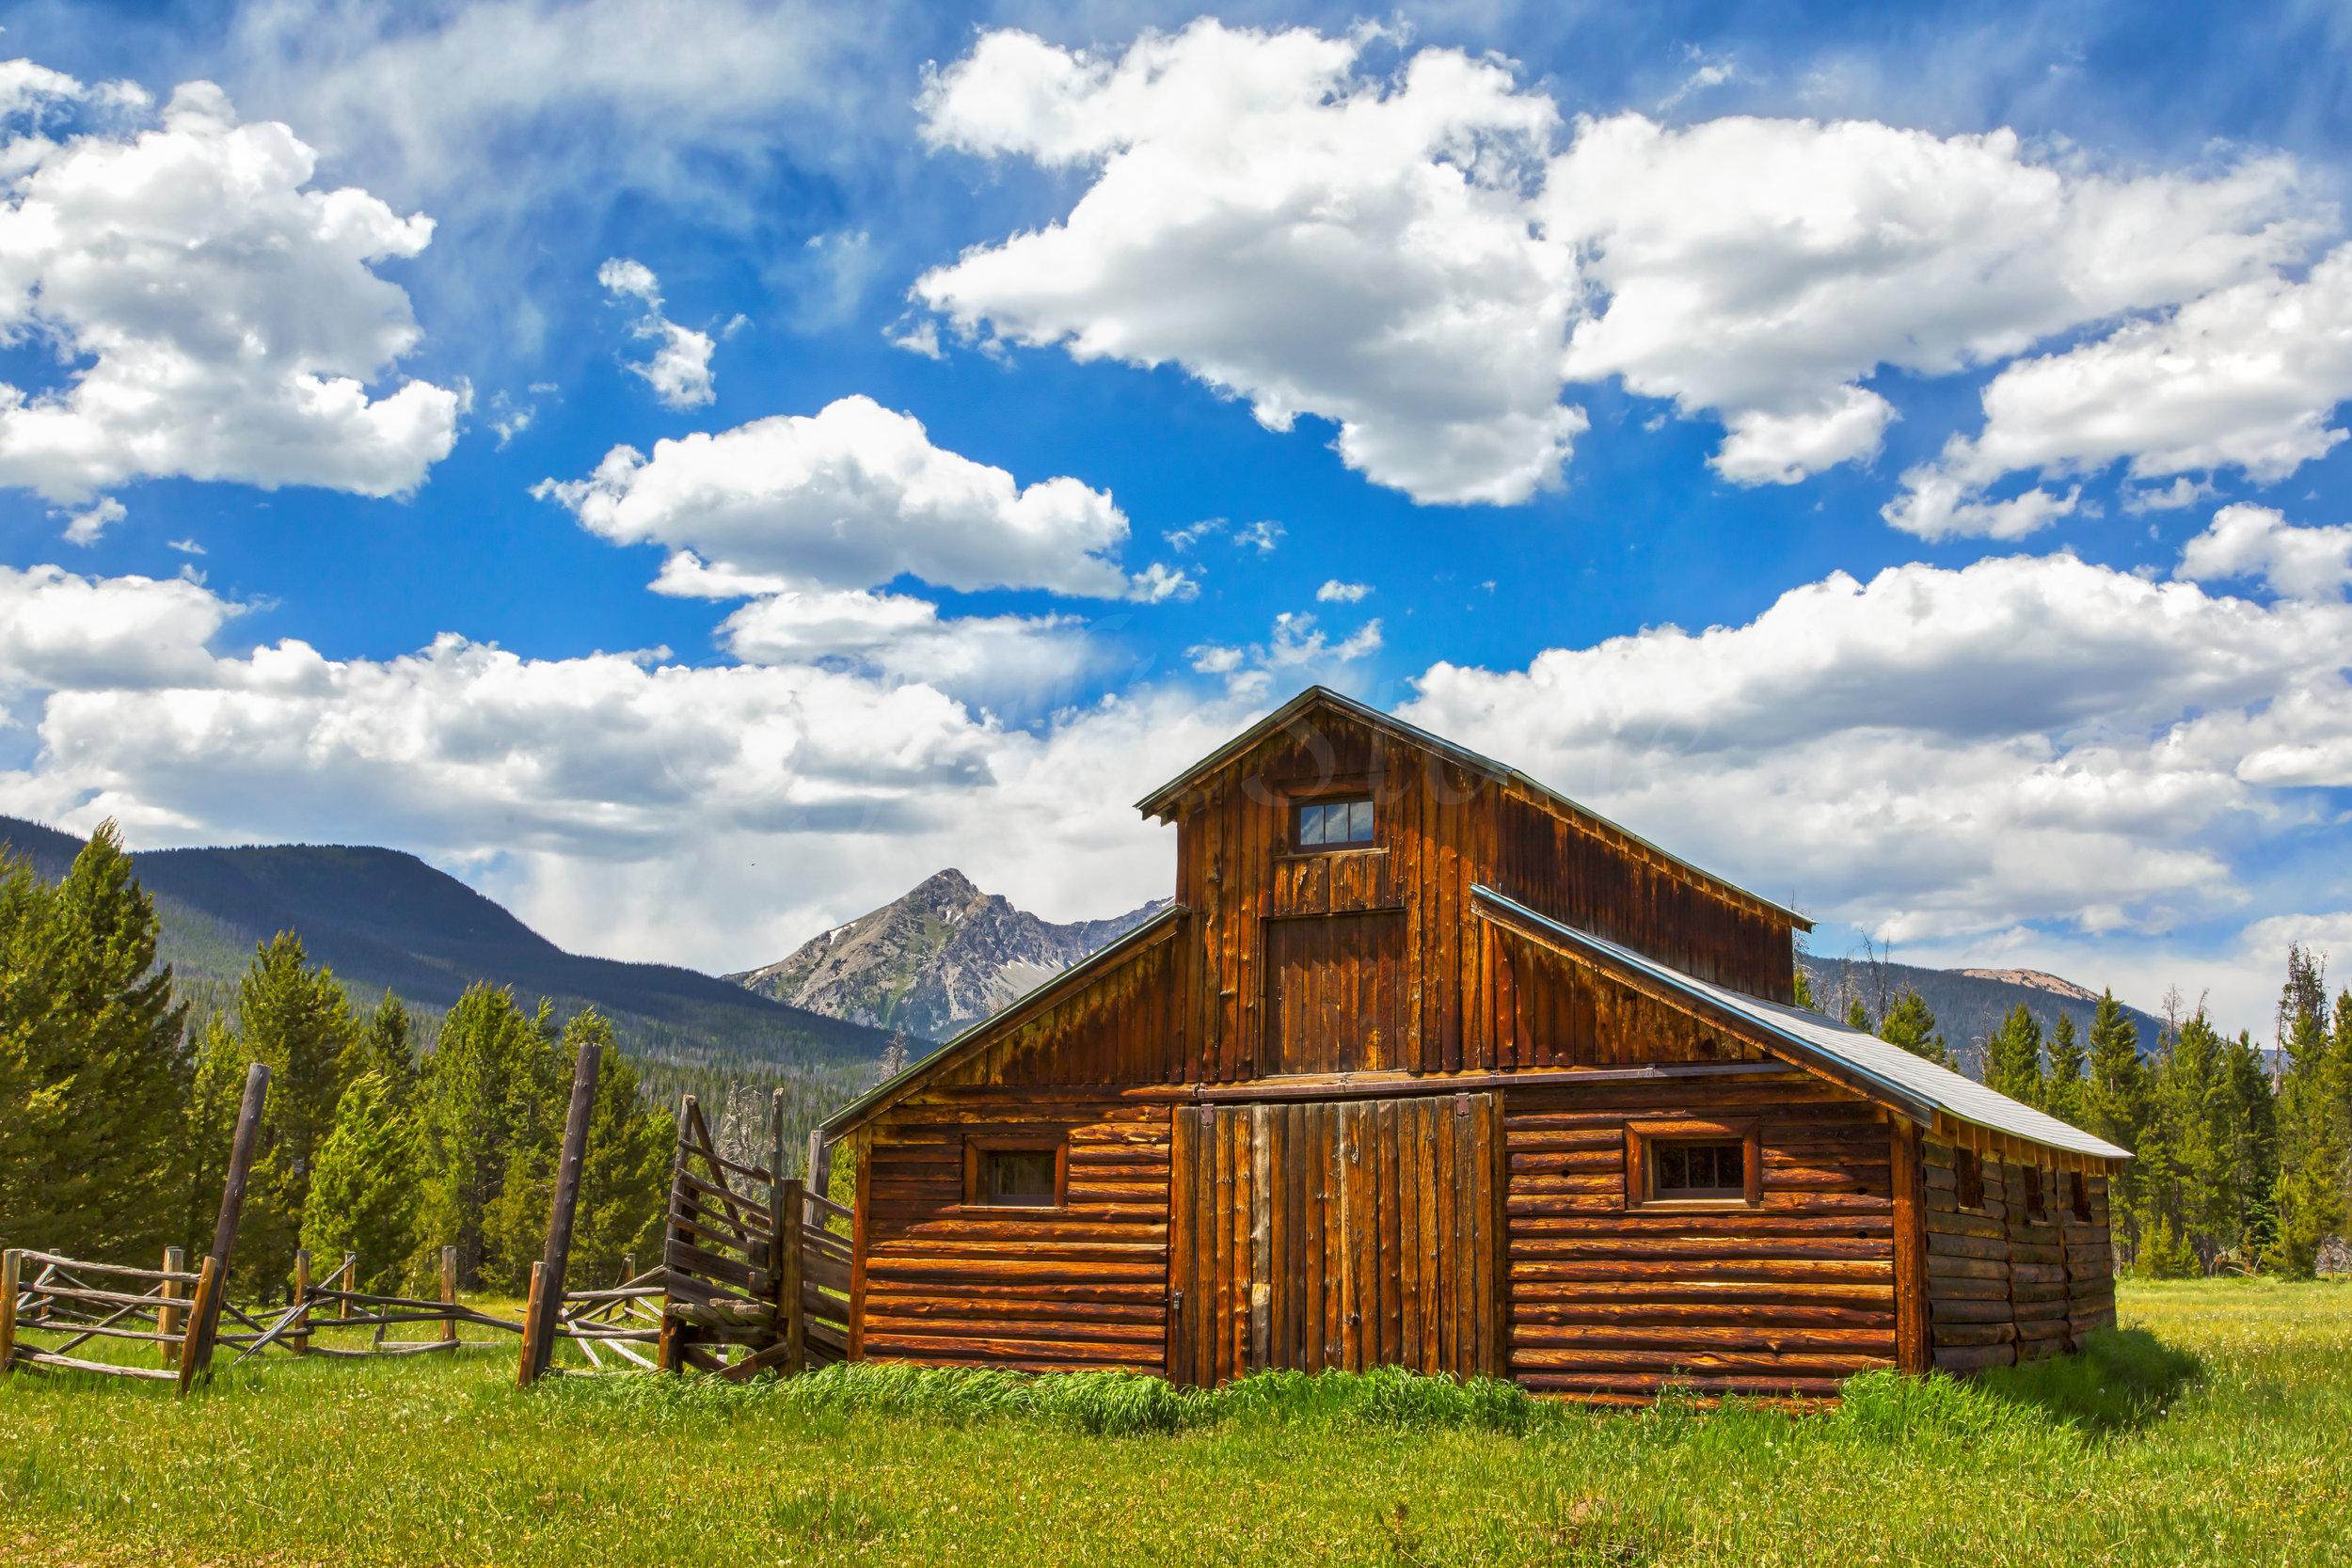 Little Buckaroo Barn, Image # 0708